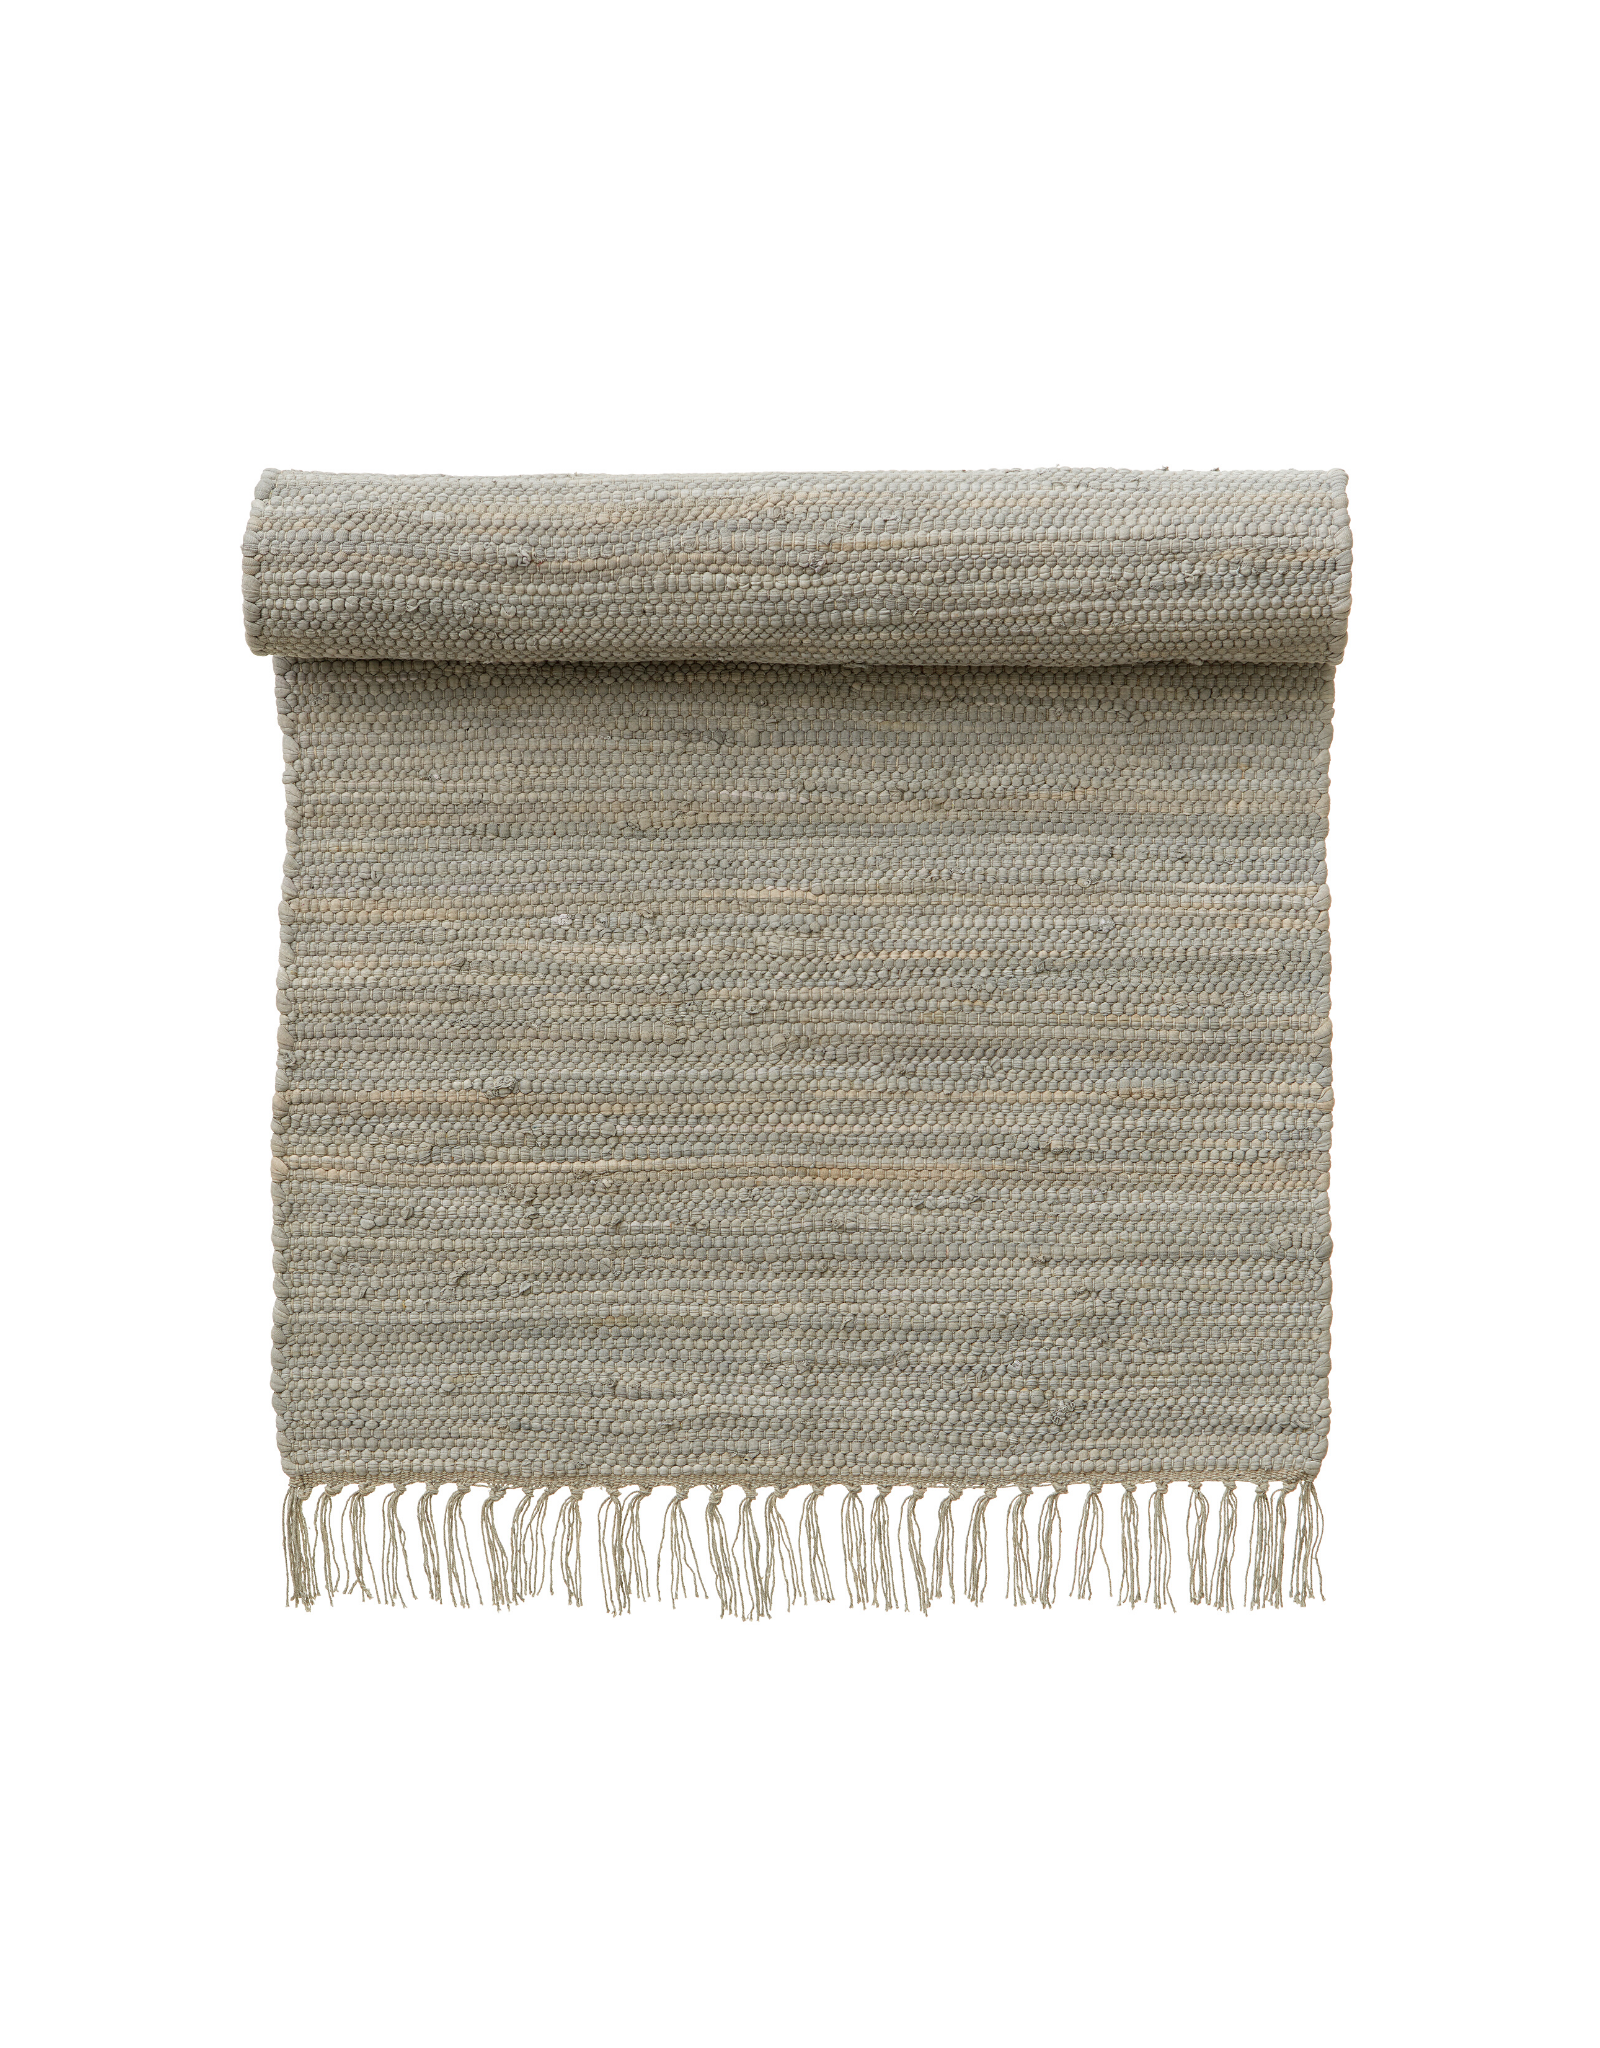 Bungalow Denmark Vloerkleed | Concrete